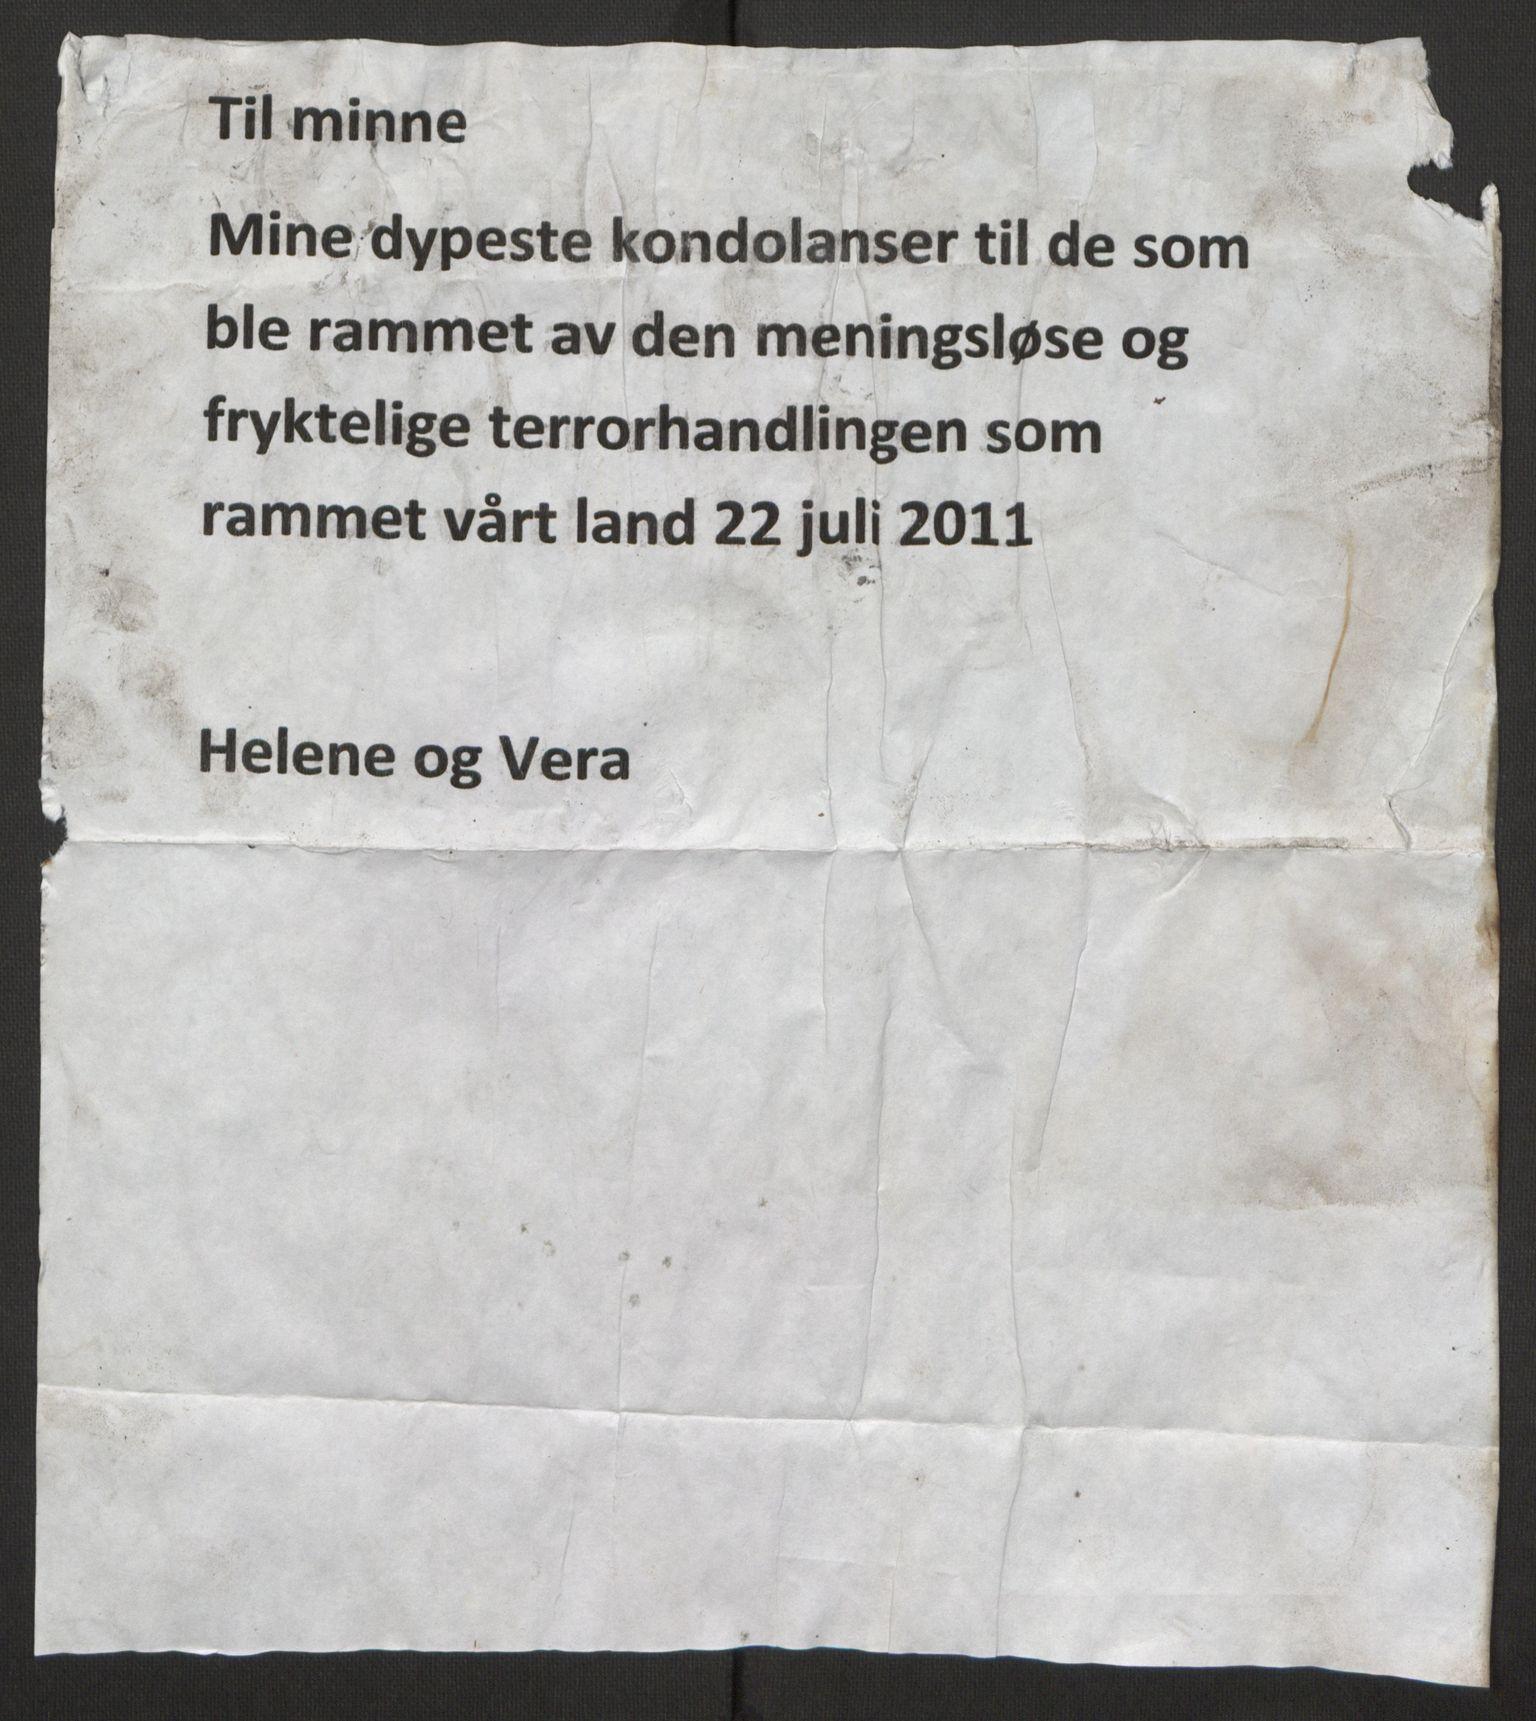 RA, Minnemateriale etter 22.07.2011, 2011, s. 402